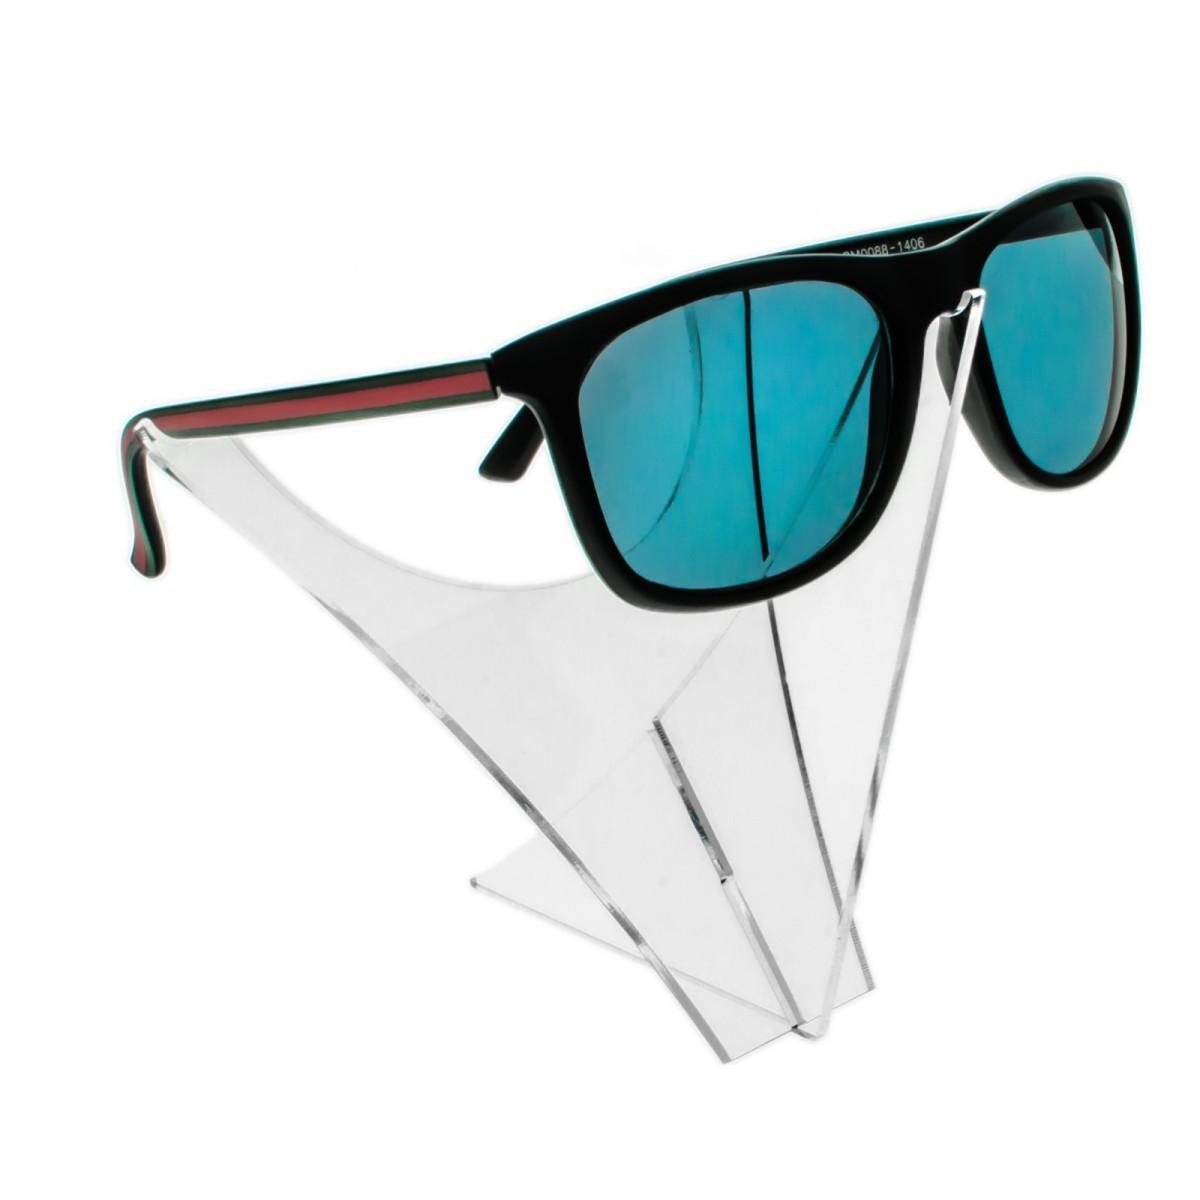 E-201 - Portaocchiali in plexiglass trasparente